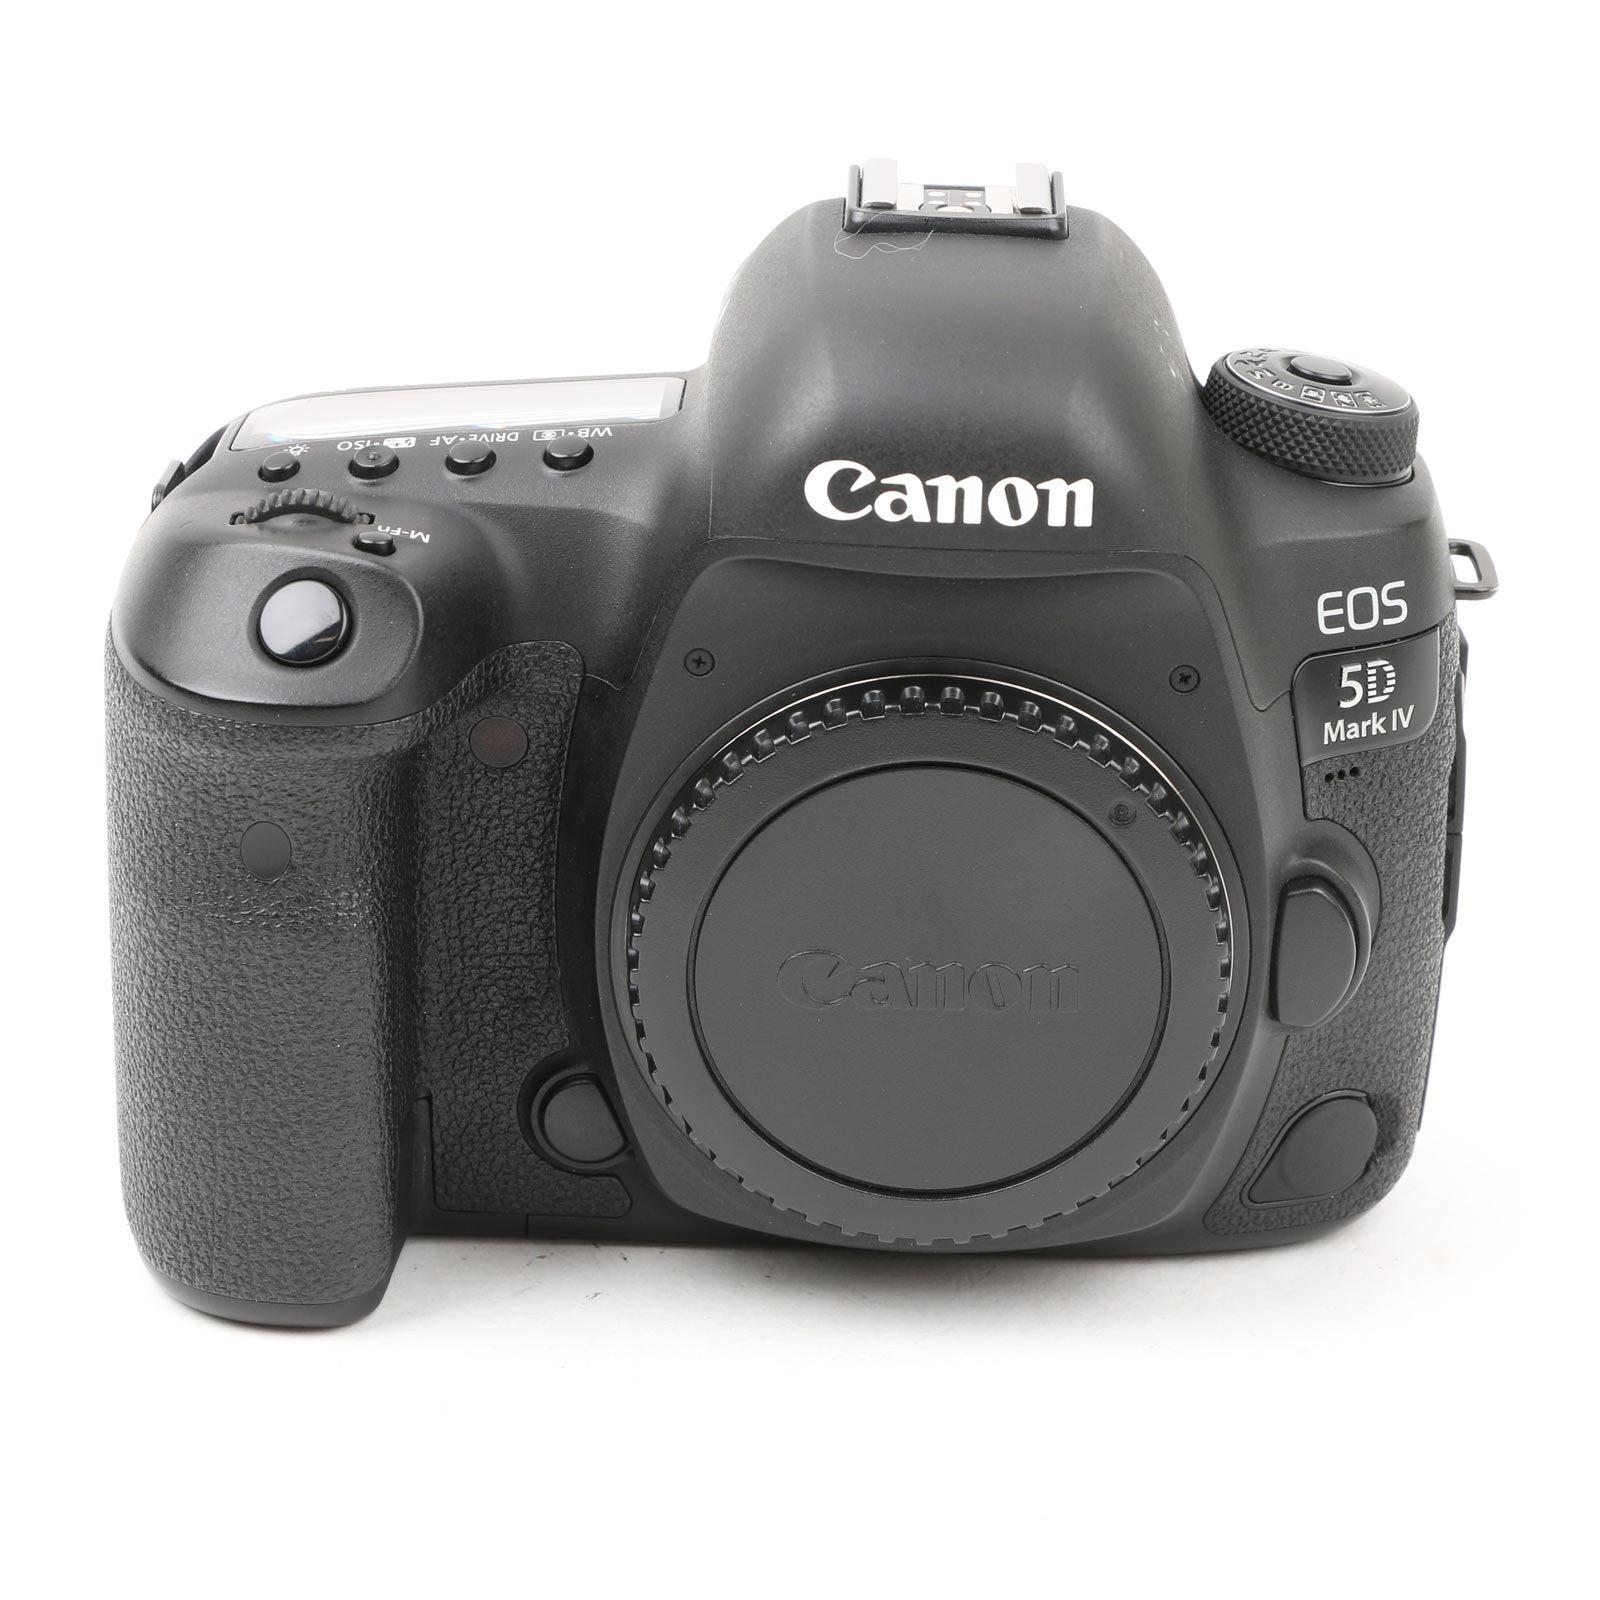 Image of Used Canon EOS 5D Mark IV Digital SLR Camera Body